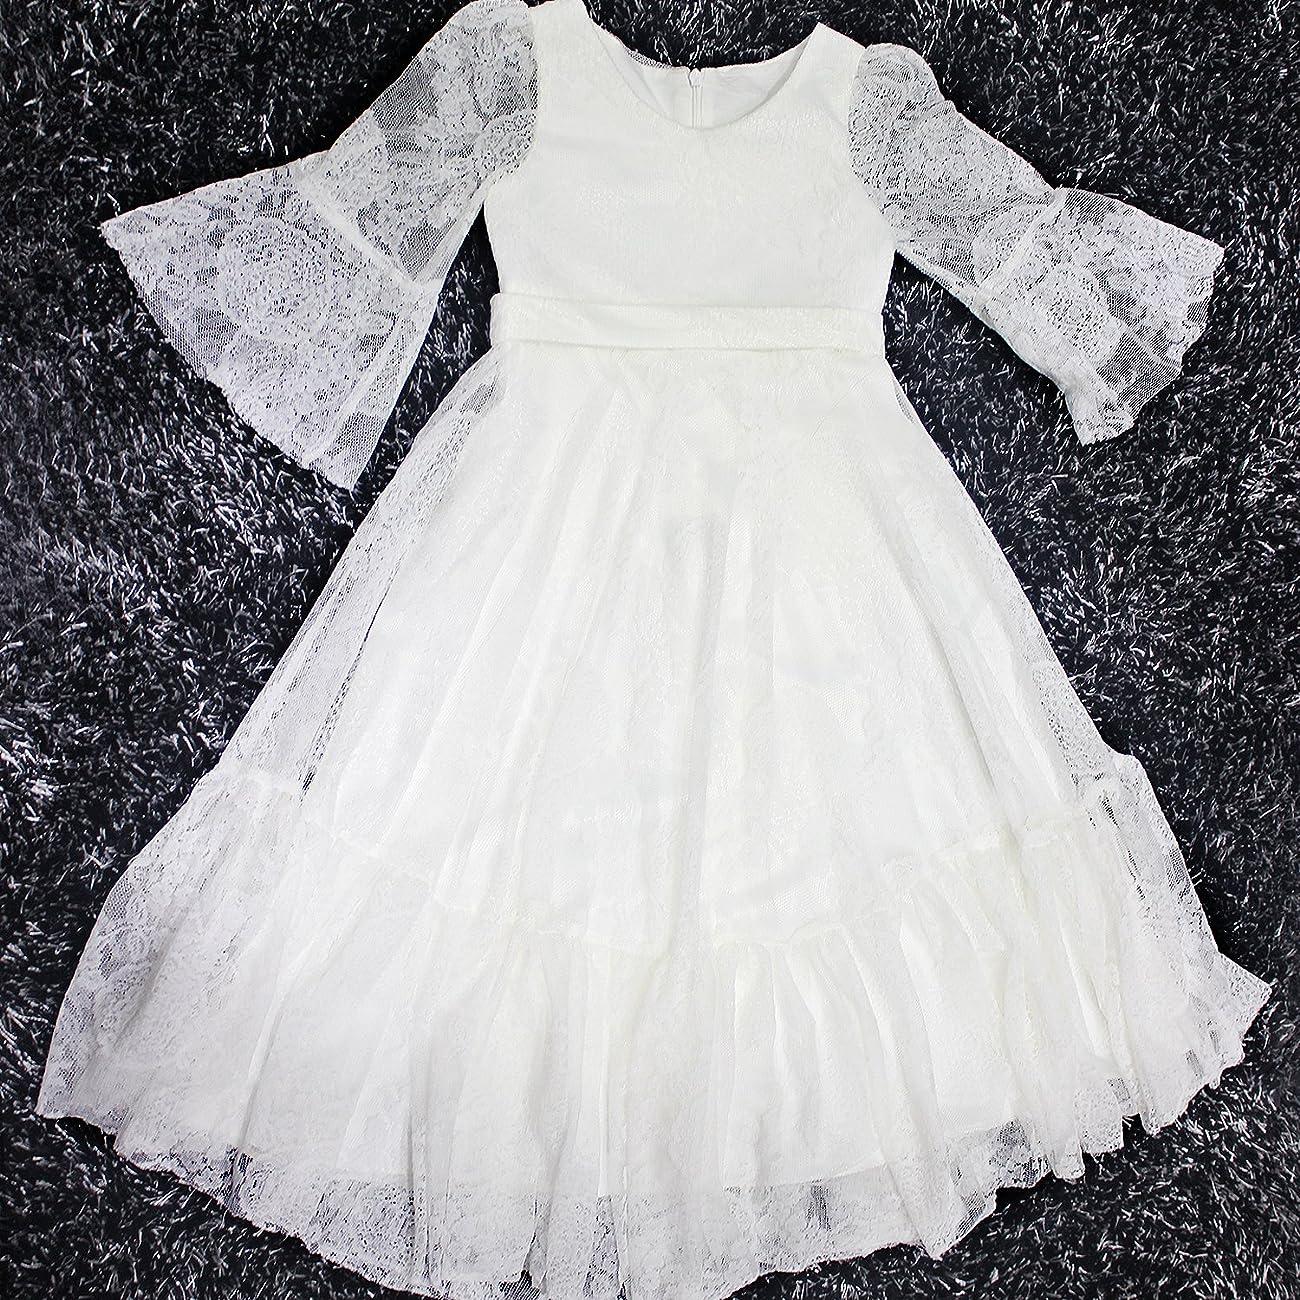 Fancy A-line Lace Flower Girl Dress 2-12 Year Old 3